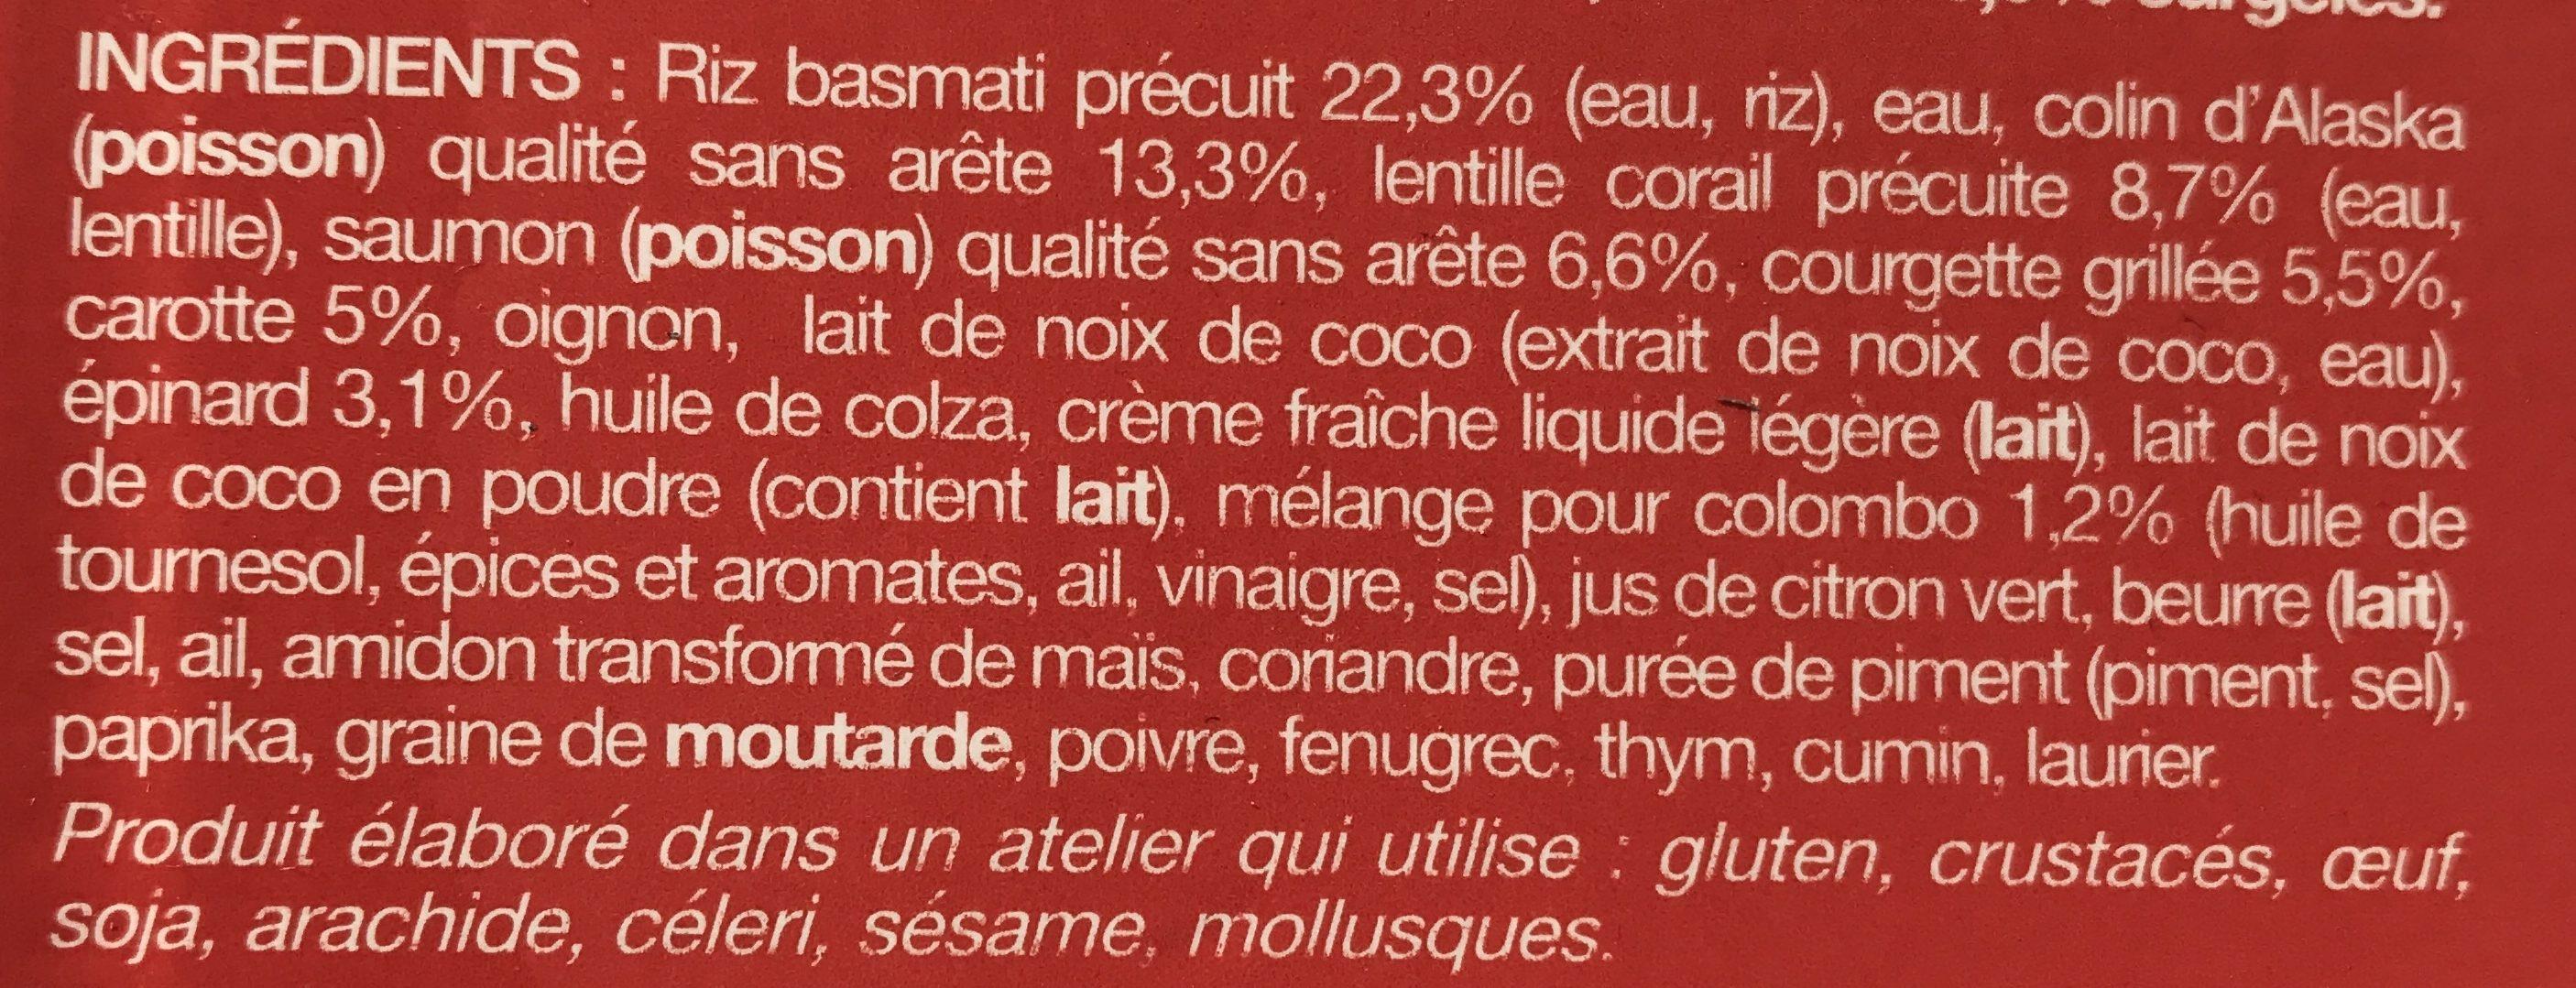 Colombo de poissons, riz et lentilles corail - Ingrediënten - fr